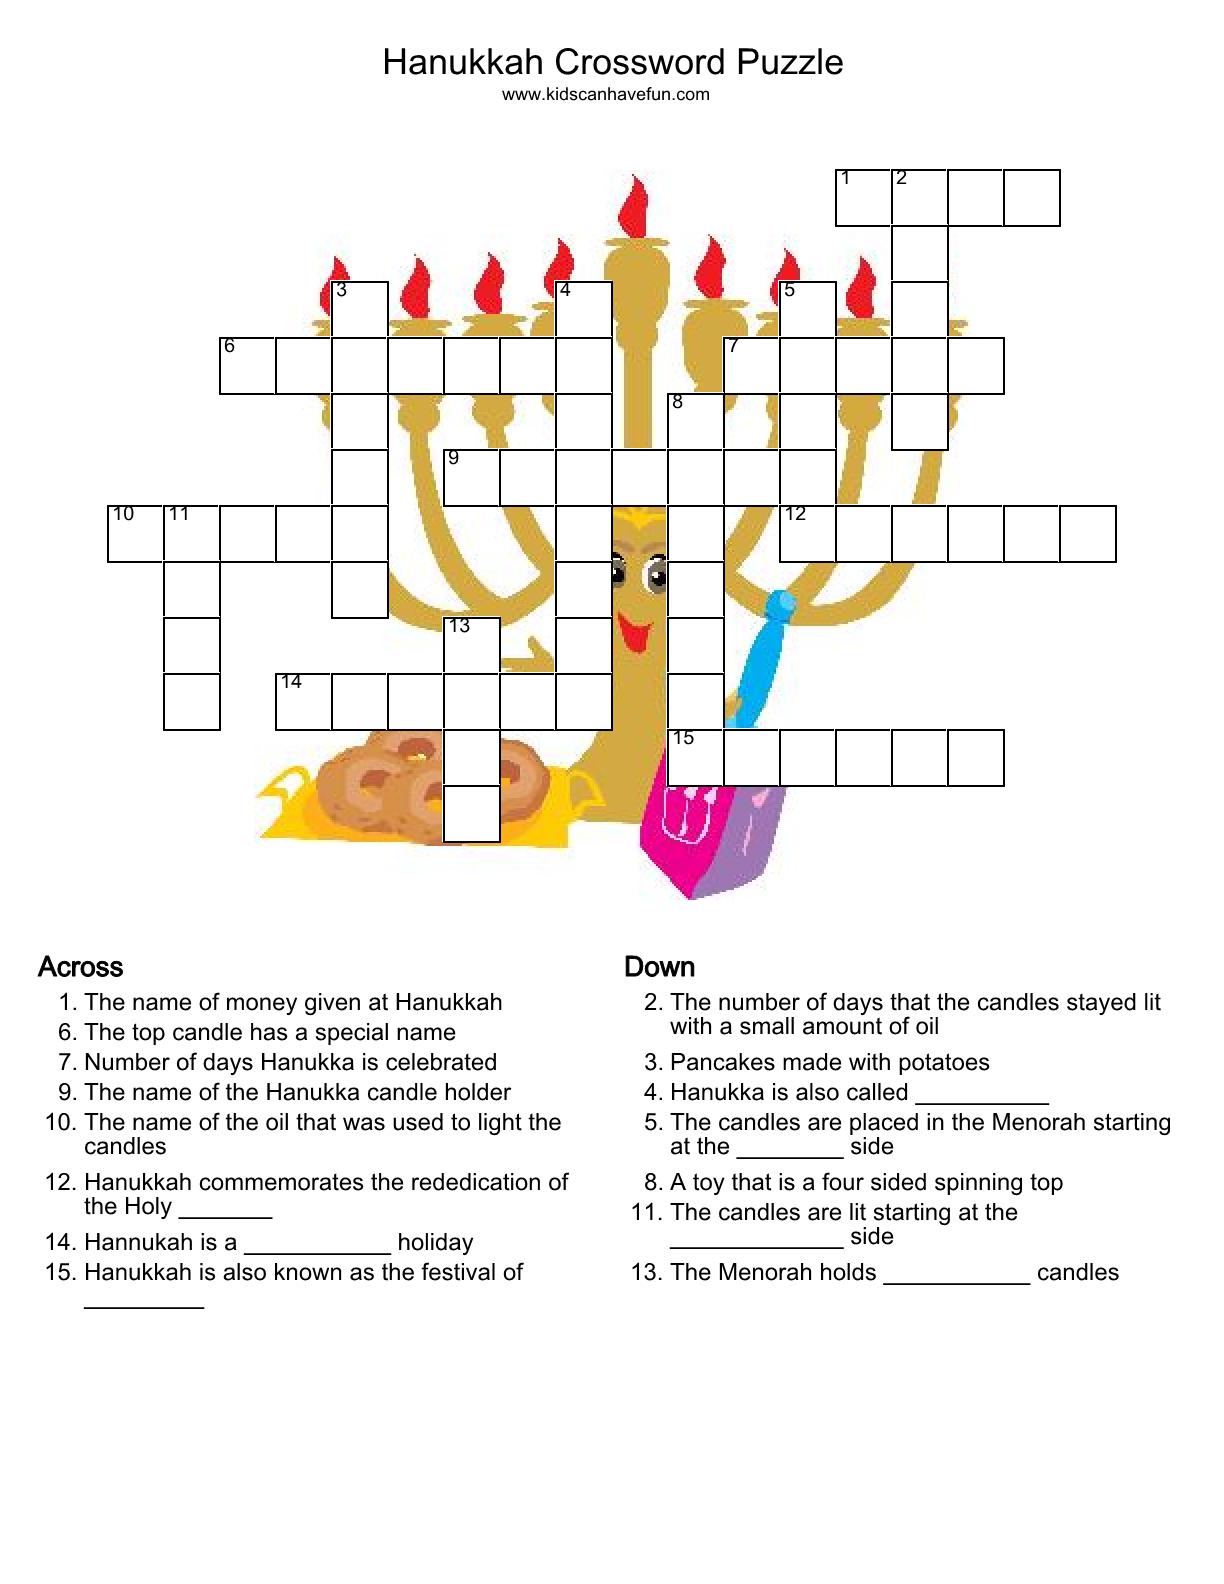 Hanukkah Crossword Puzzle http://www.kidscanhavefun.com/crosswords ...